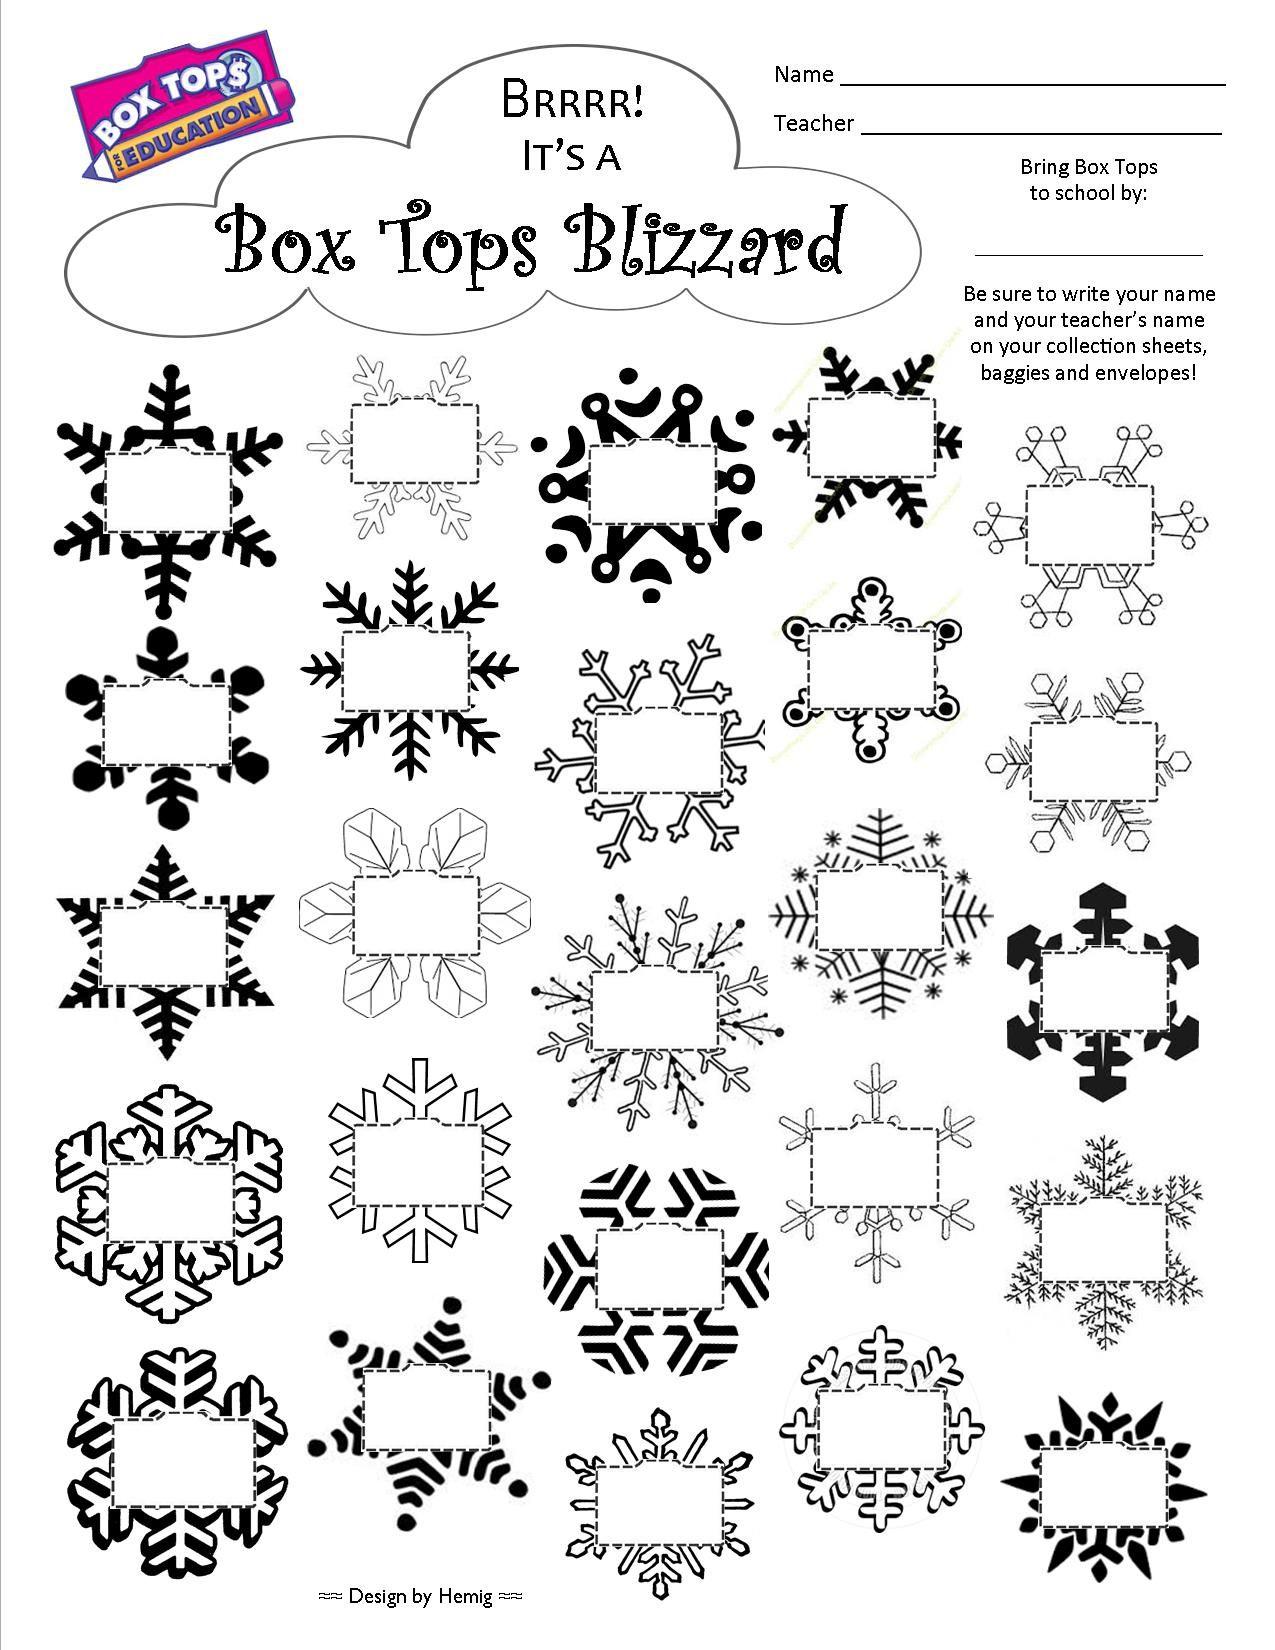 Organized Box Tops